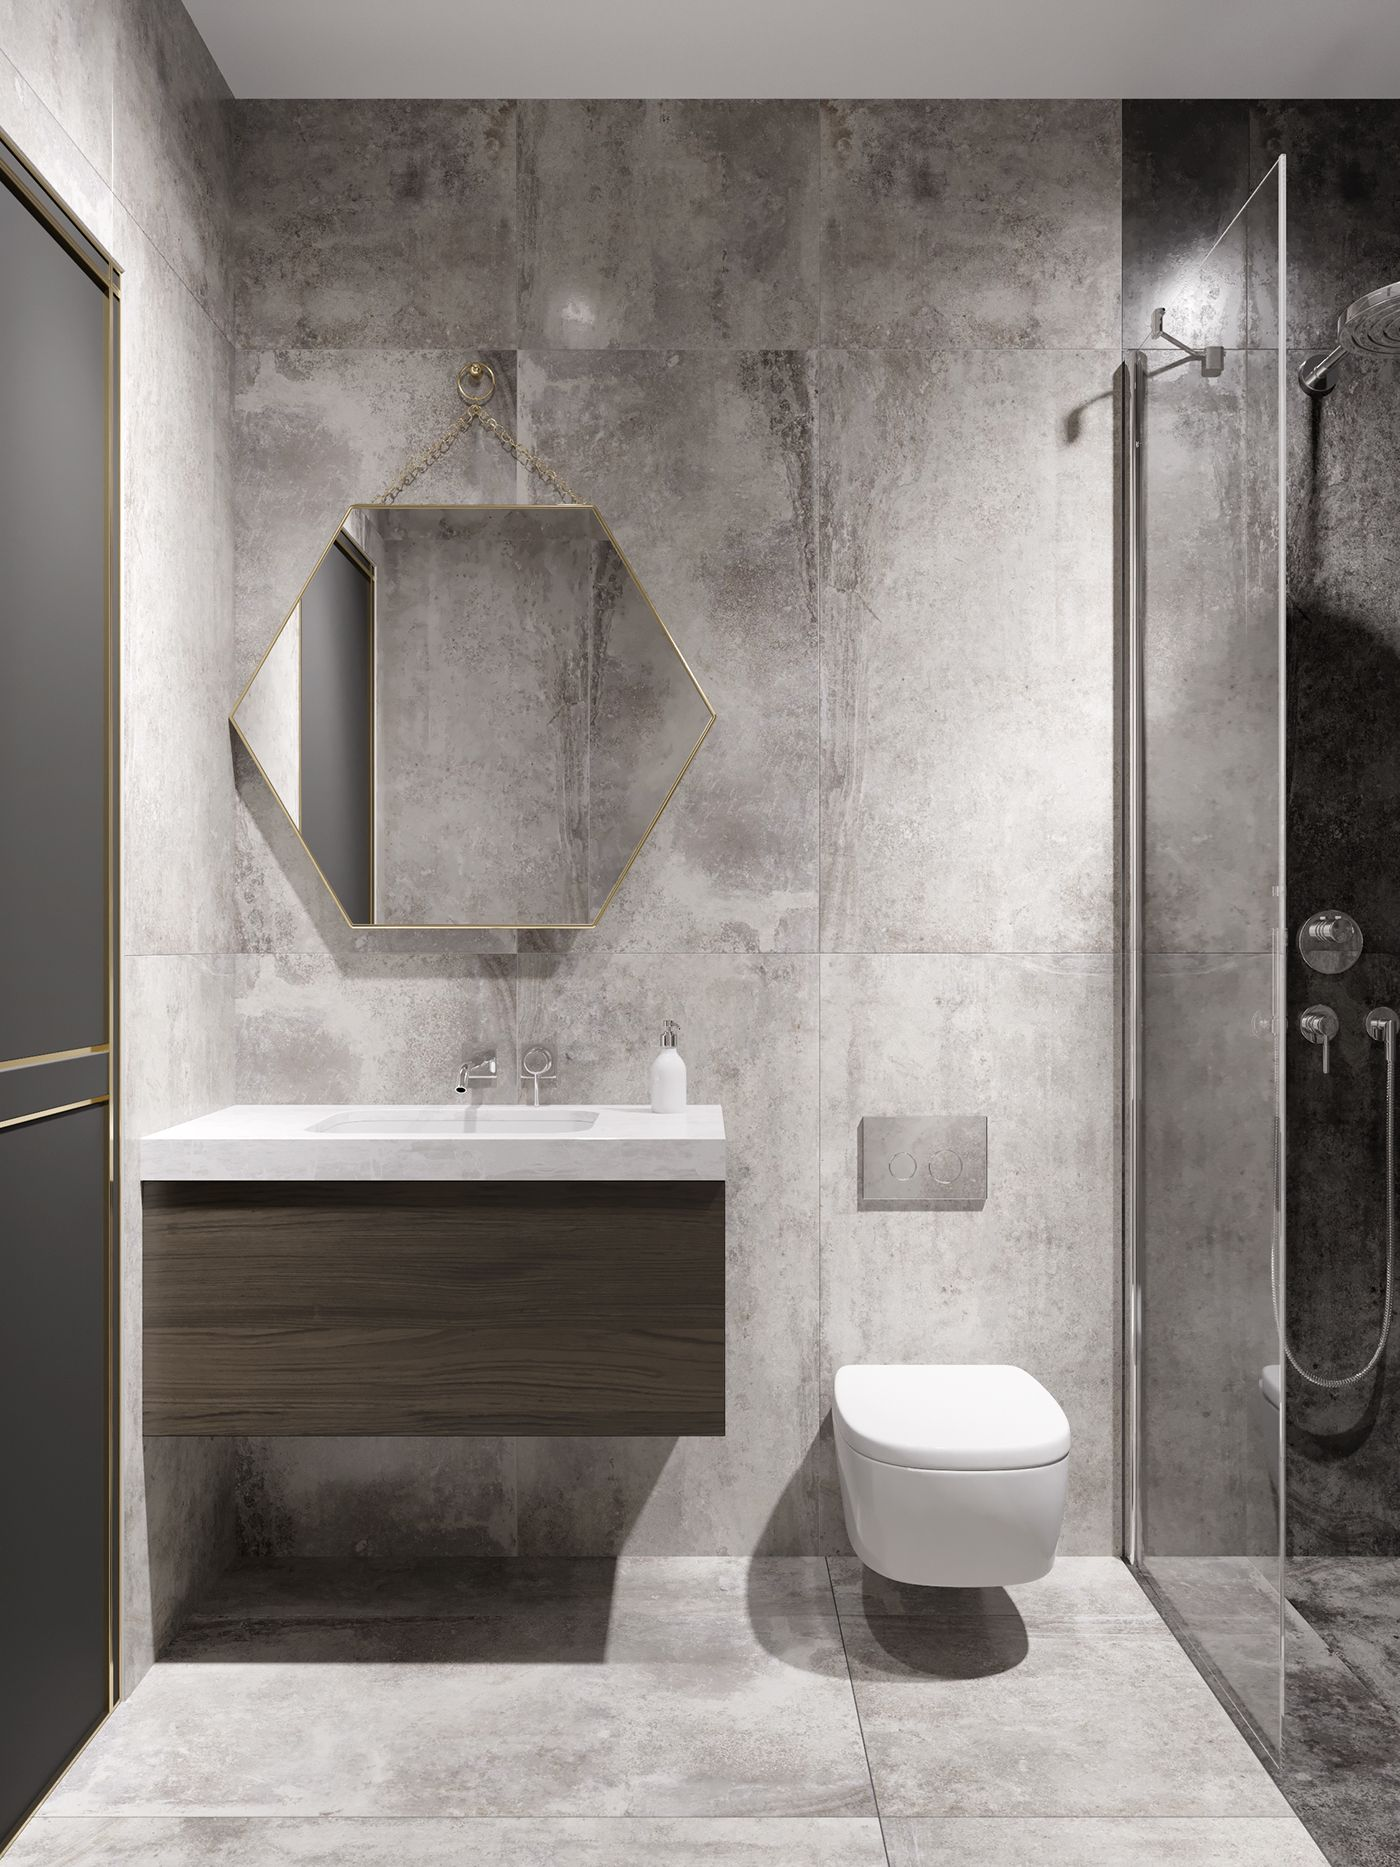 Pin by claudia maydorn on gästebad pinterest toilet interiors